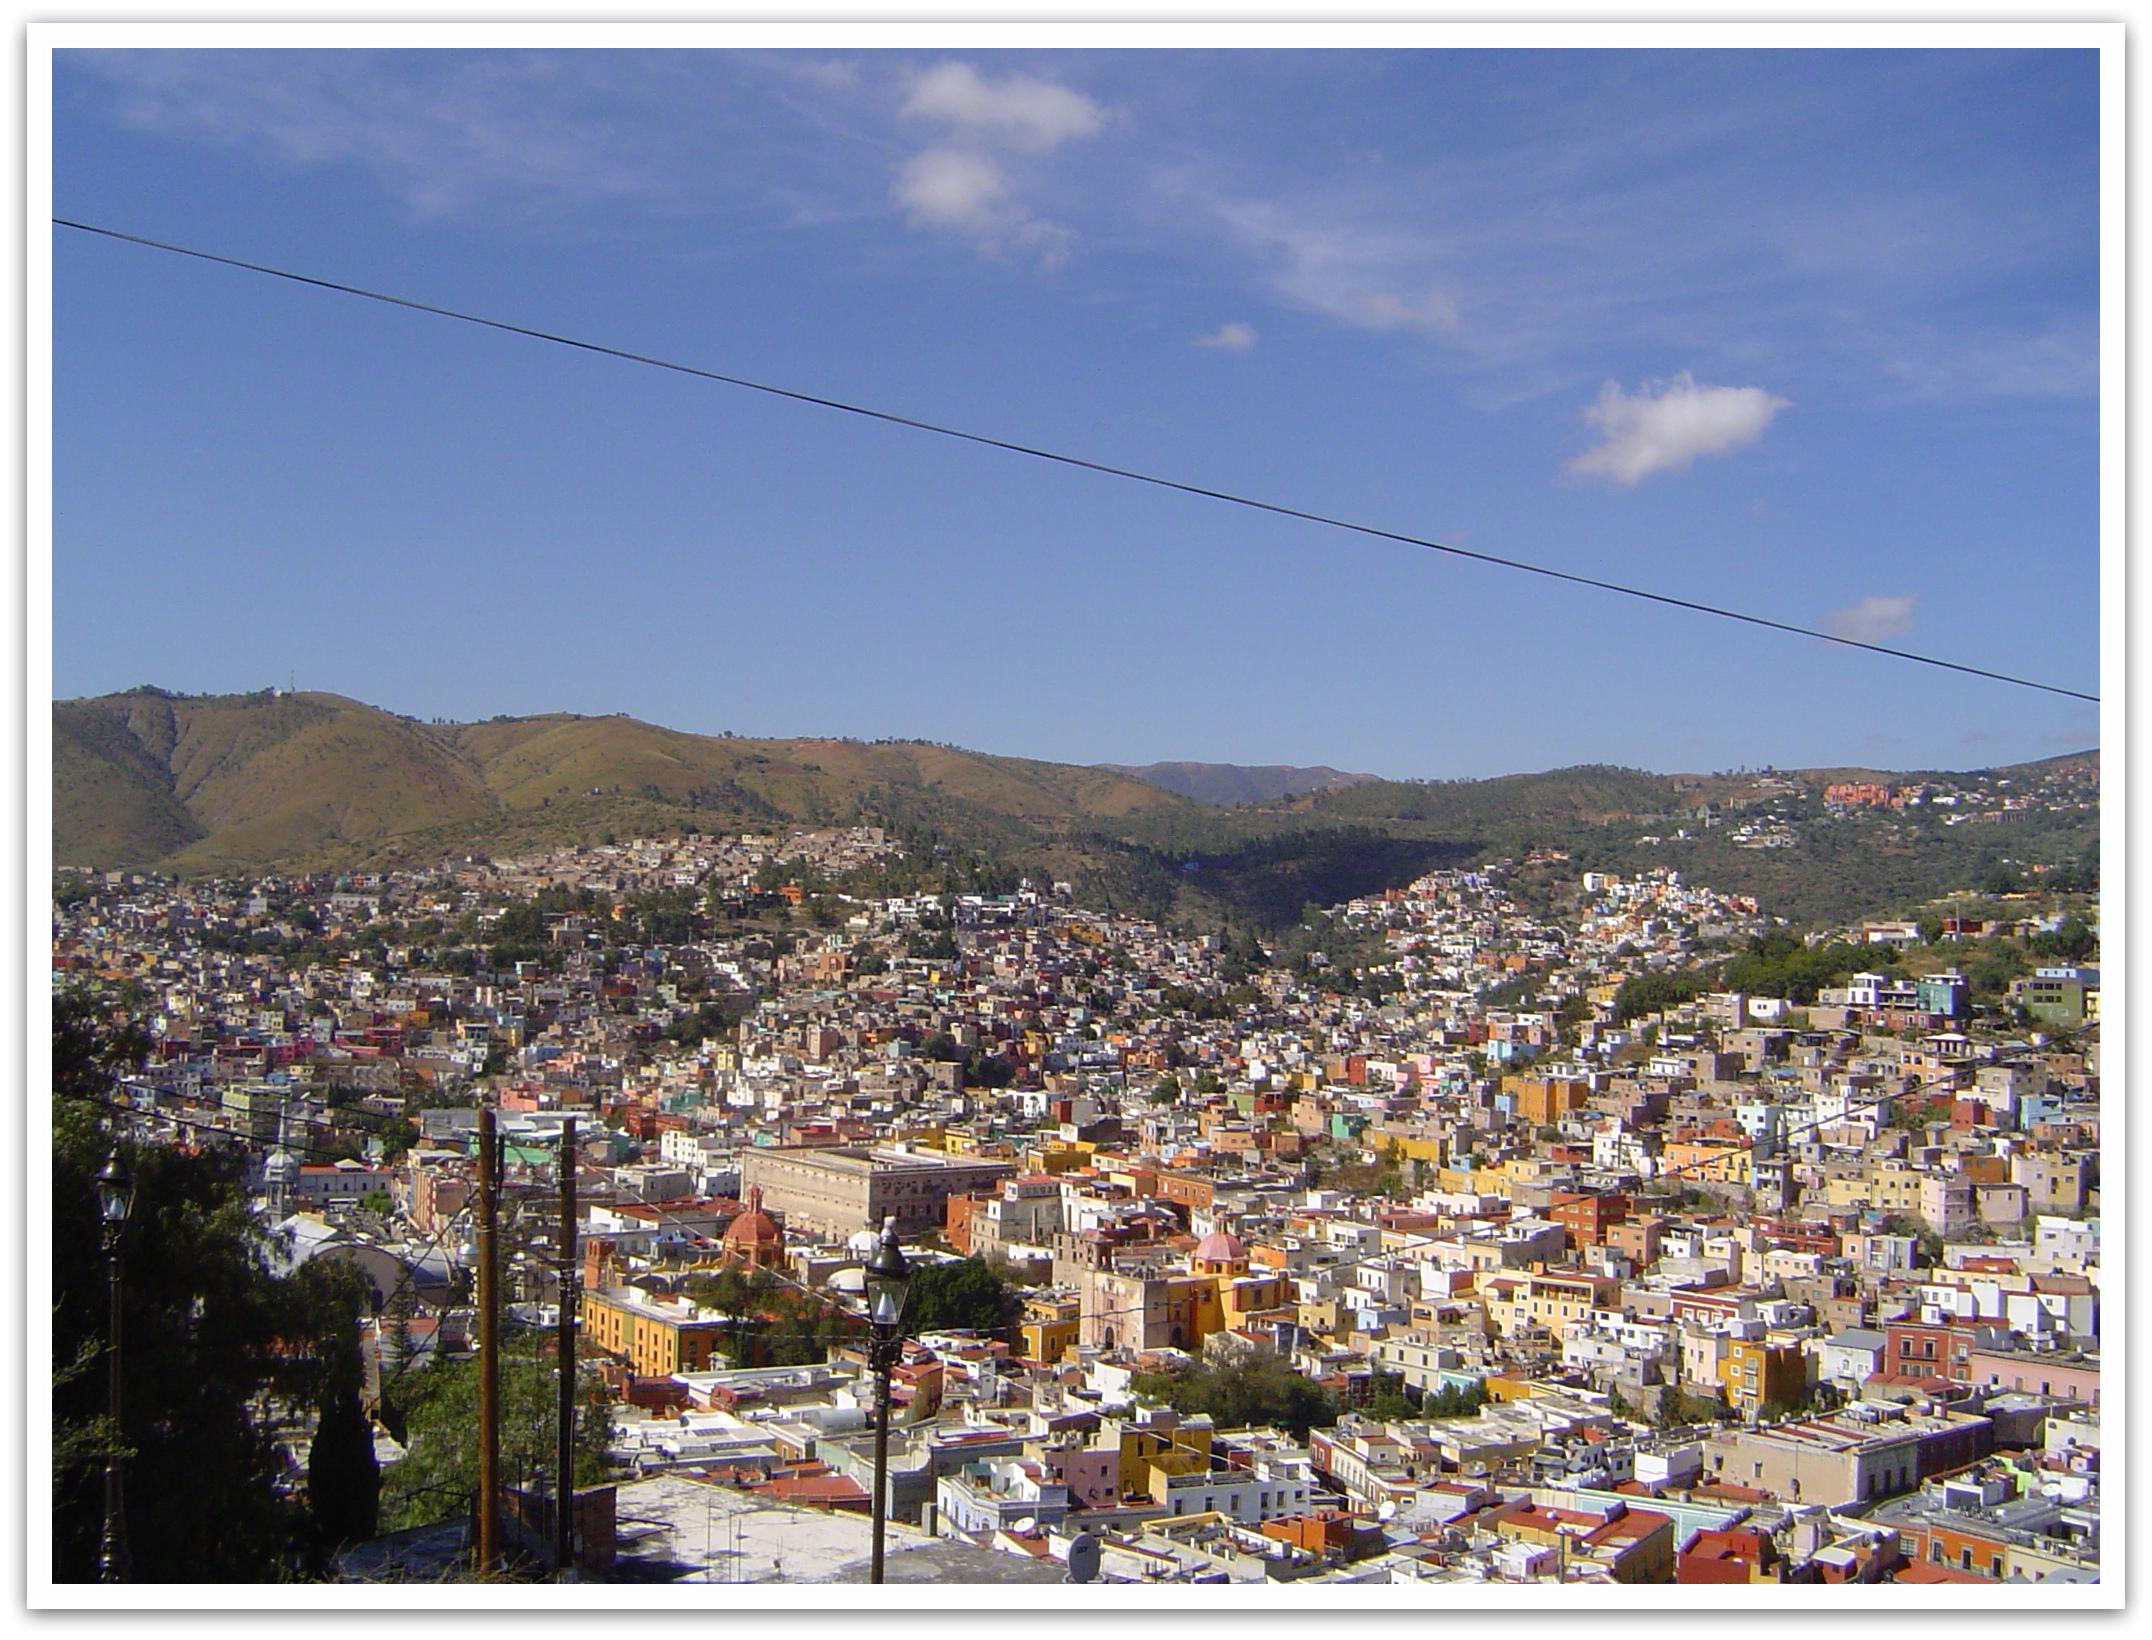 Guanajuato ein UNESCO Weltkulturerbe in Mexiko